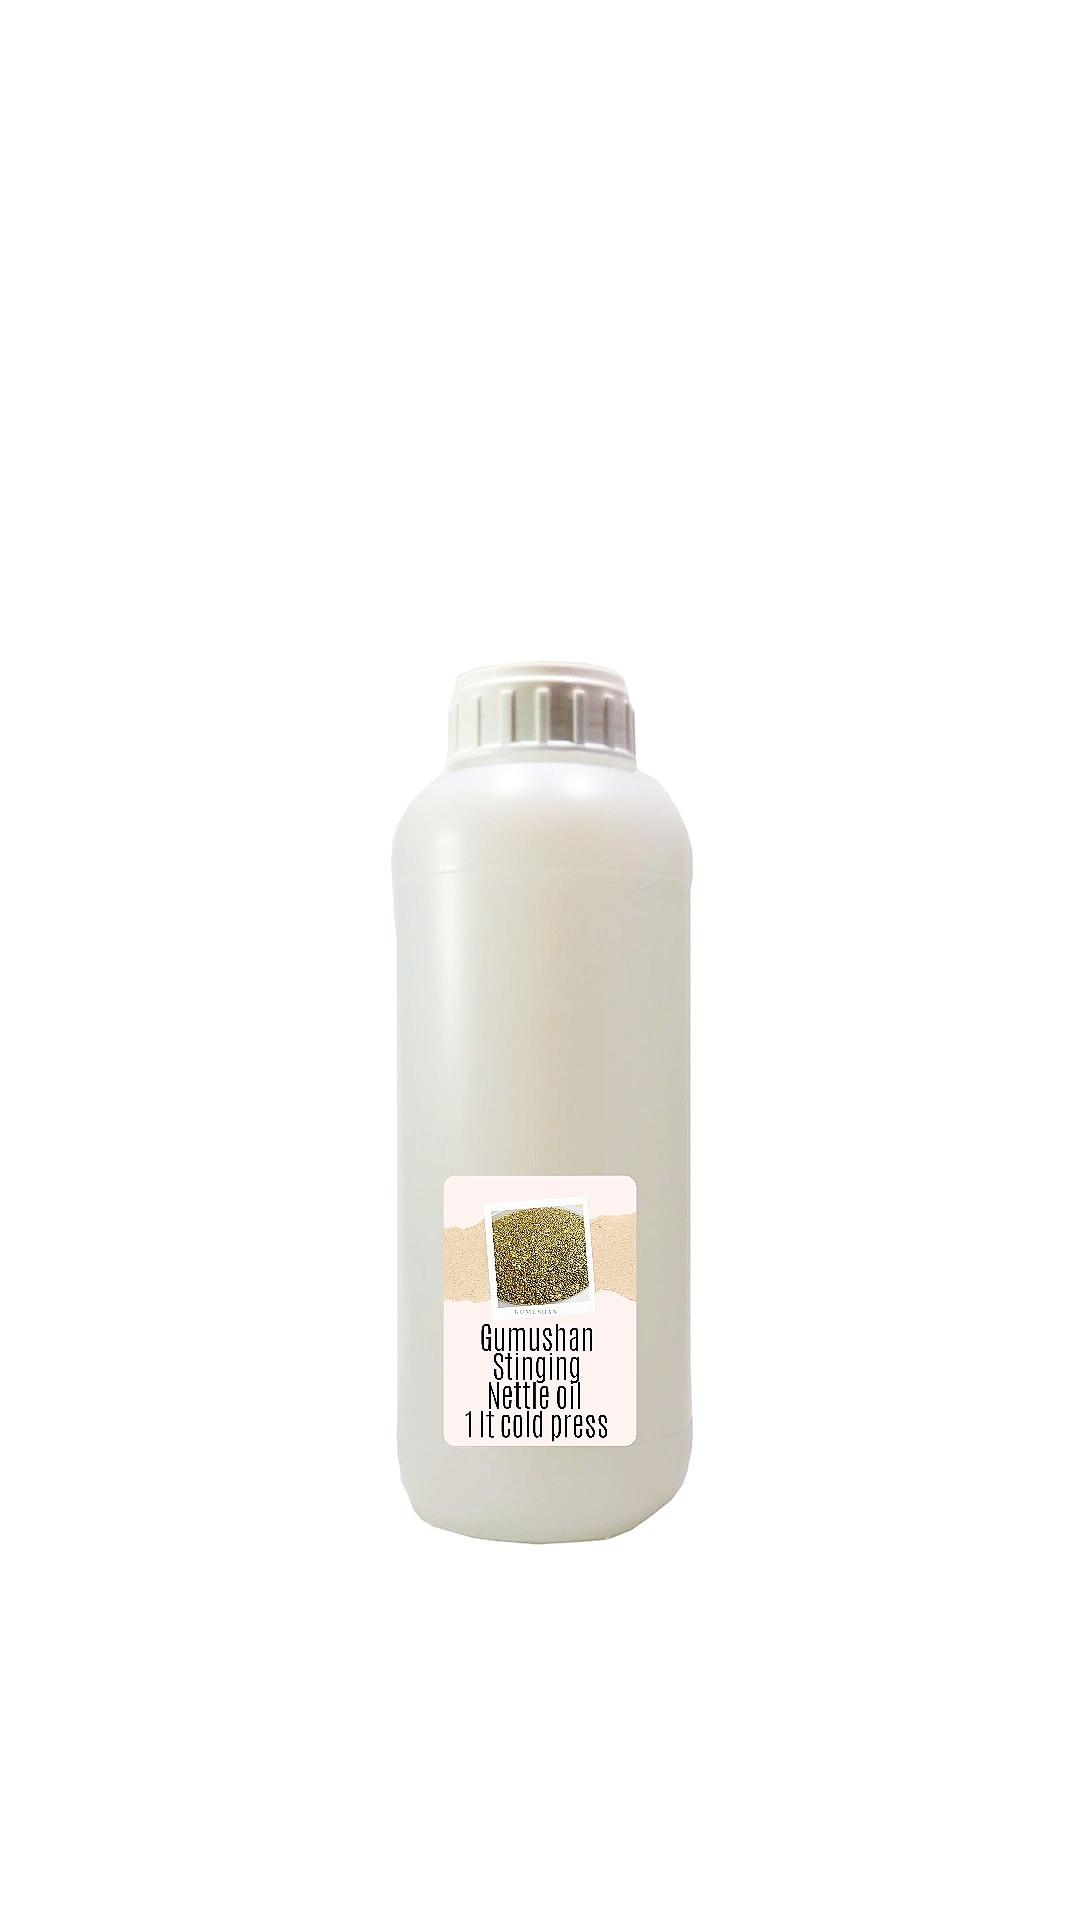 High quality pure Stinging Nettle Seed Oil 1 liter 34 fl oz 1000ml